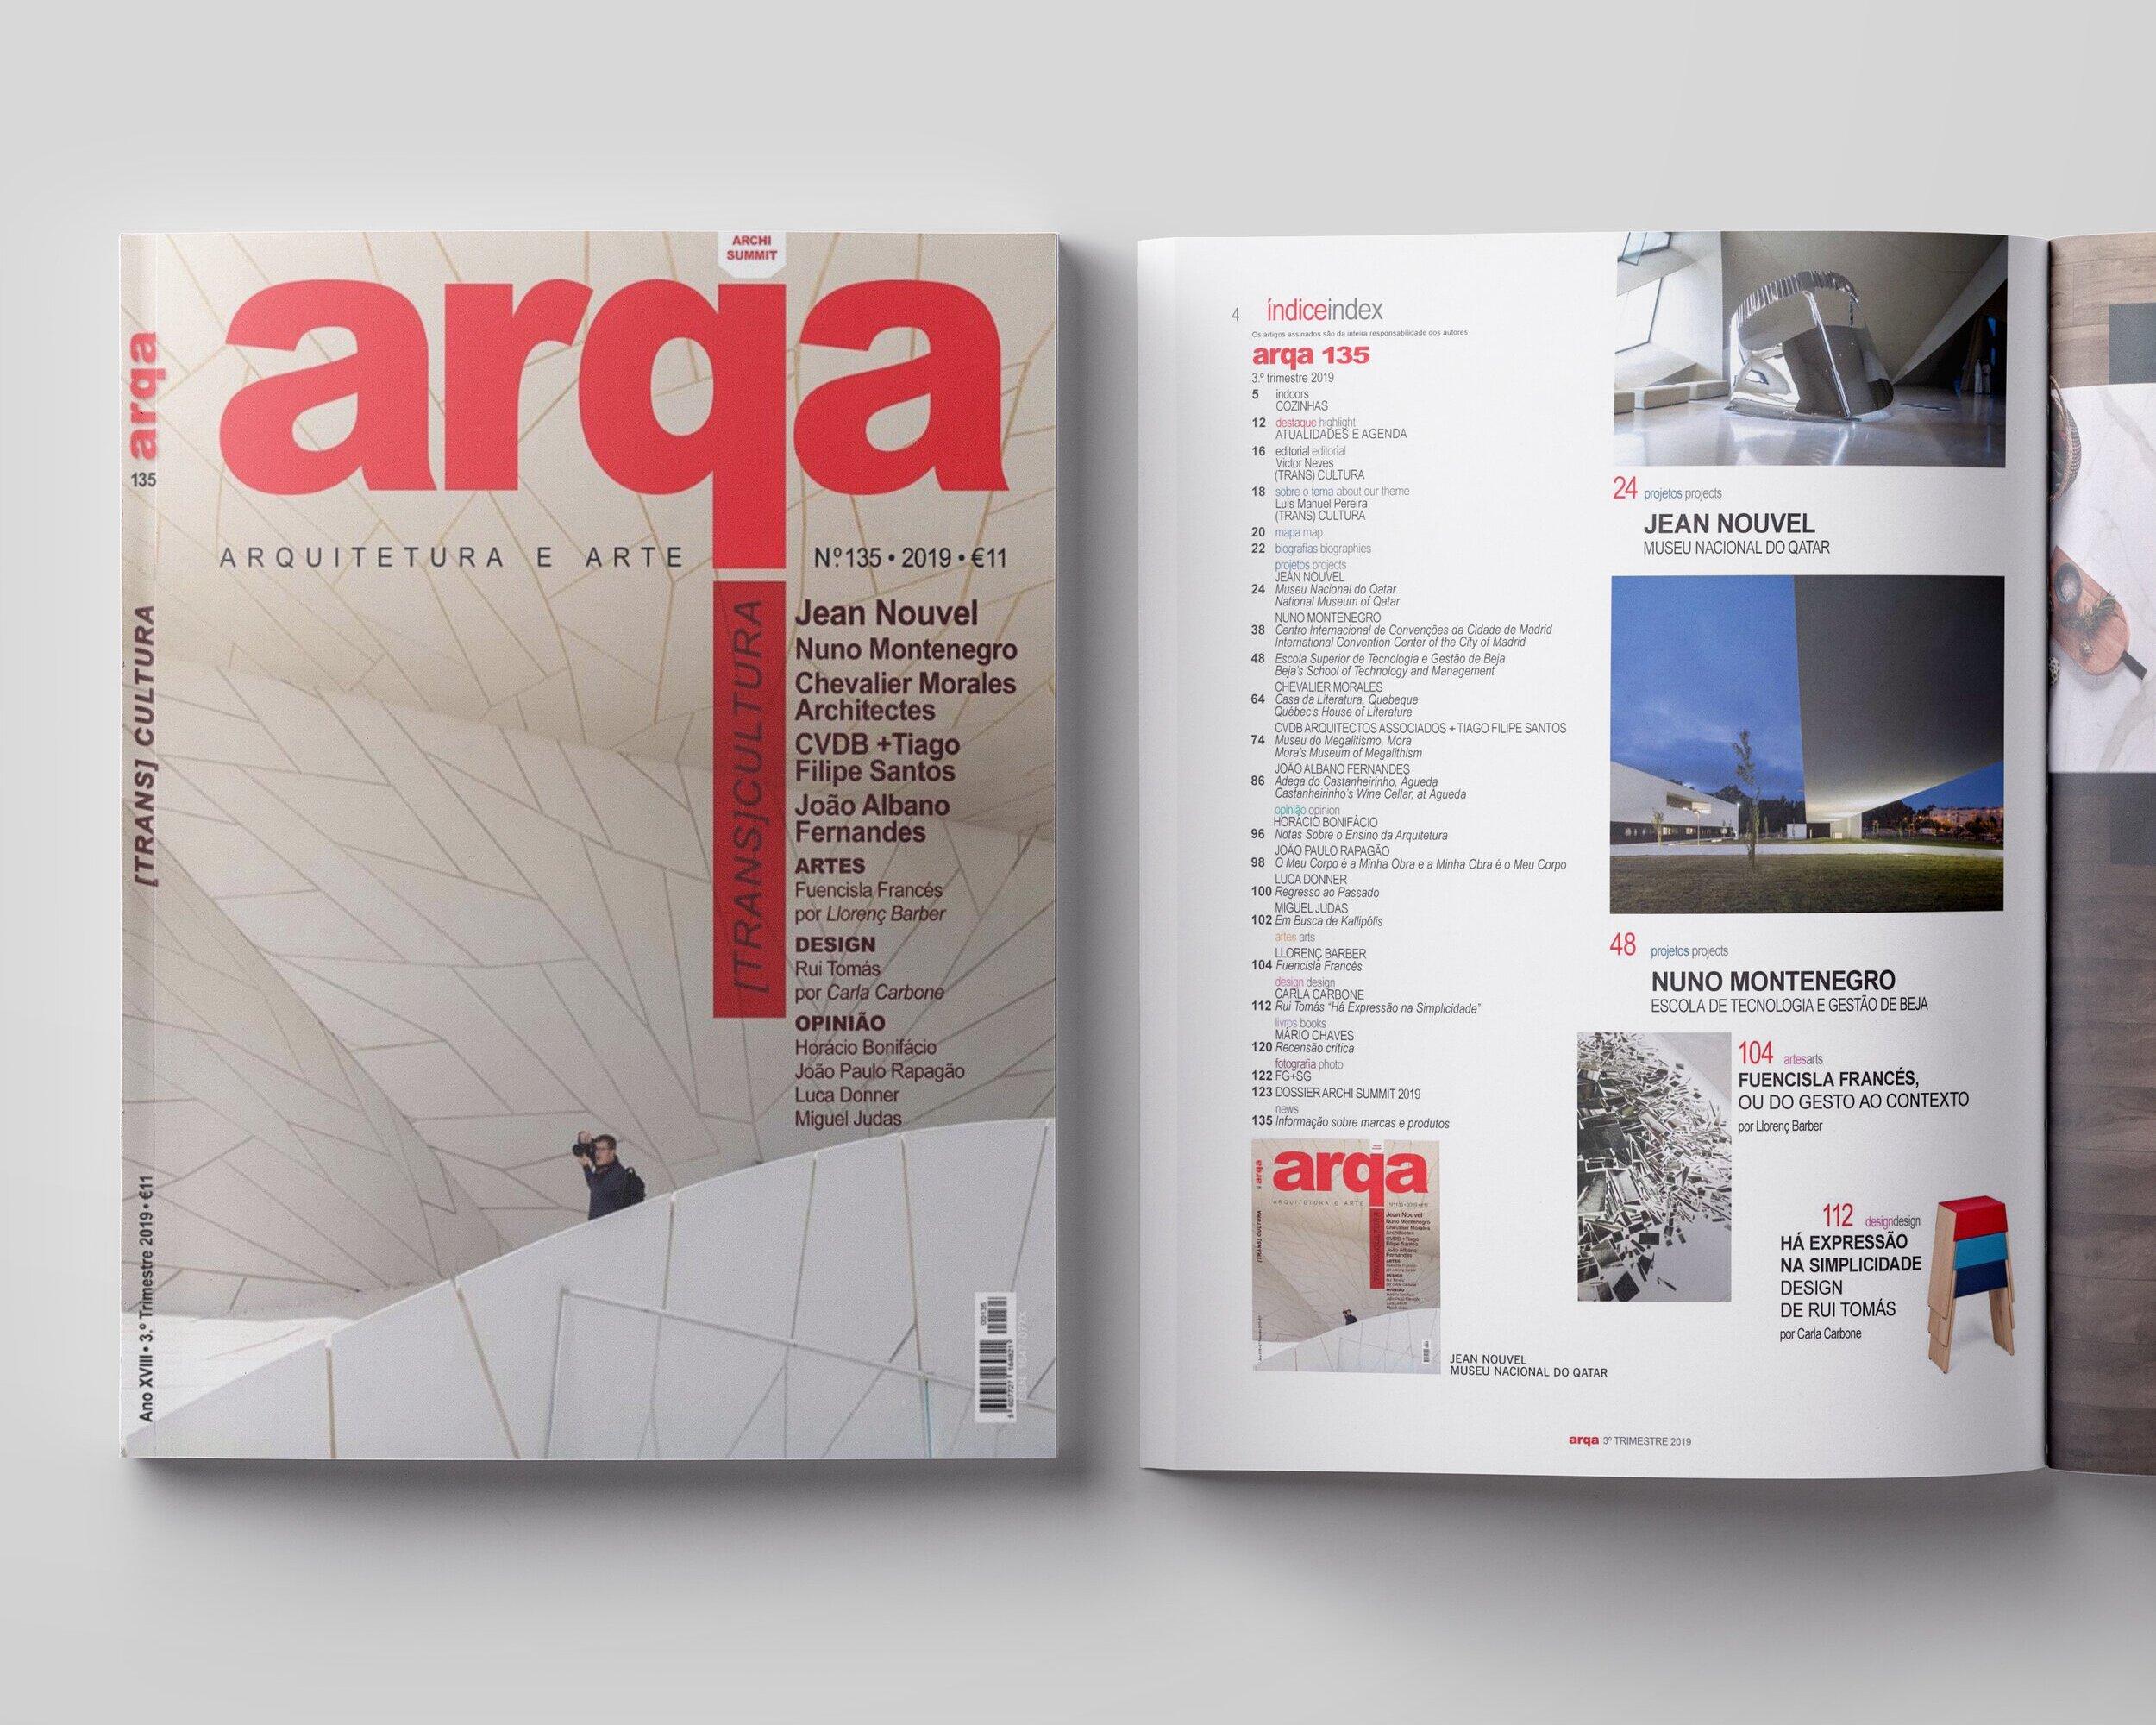 Design Rui Tomas ARQA 0.jpg